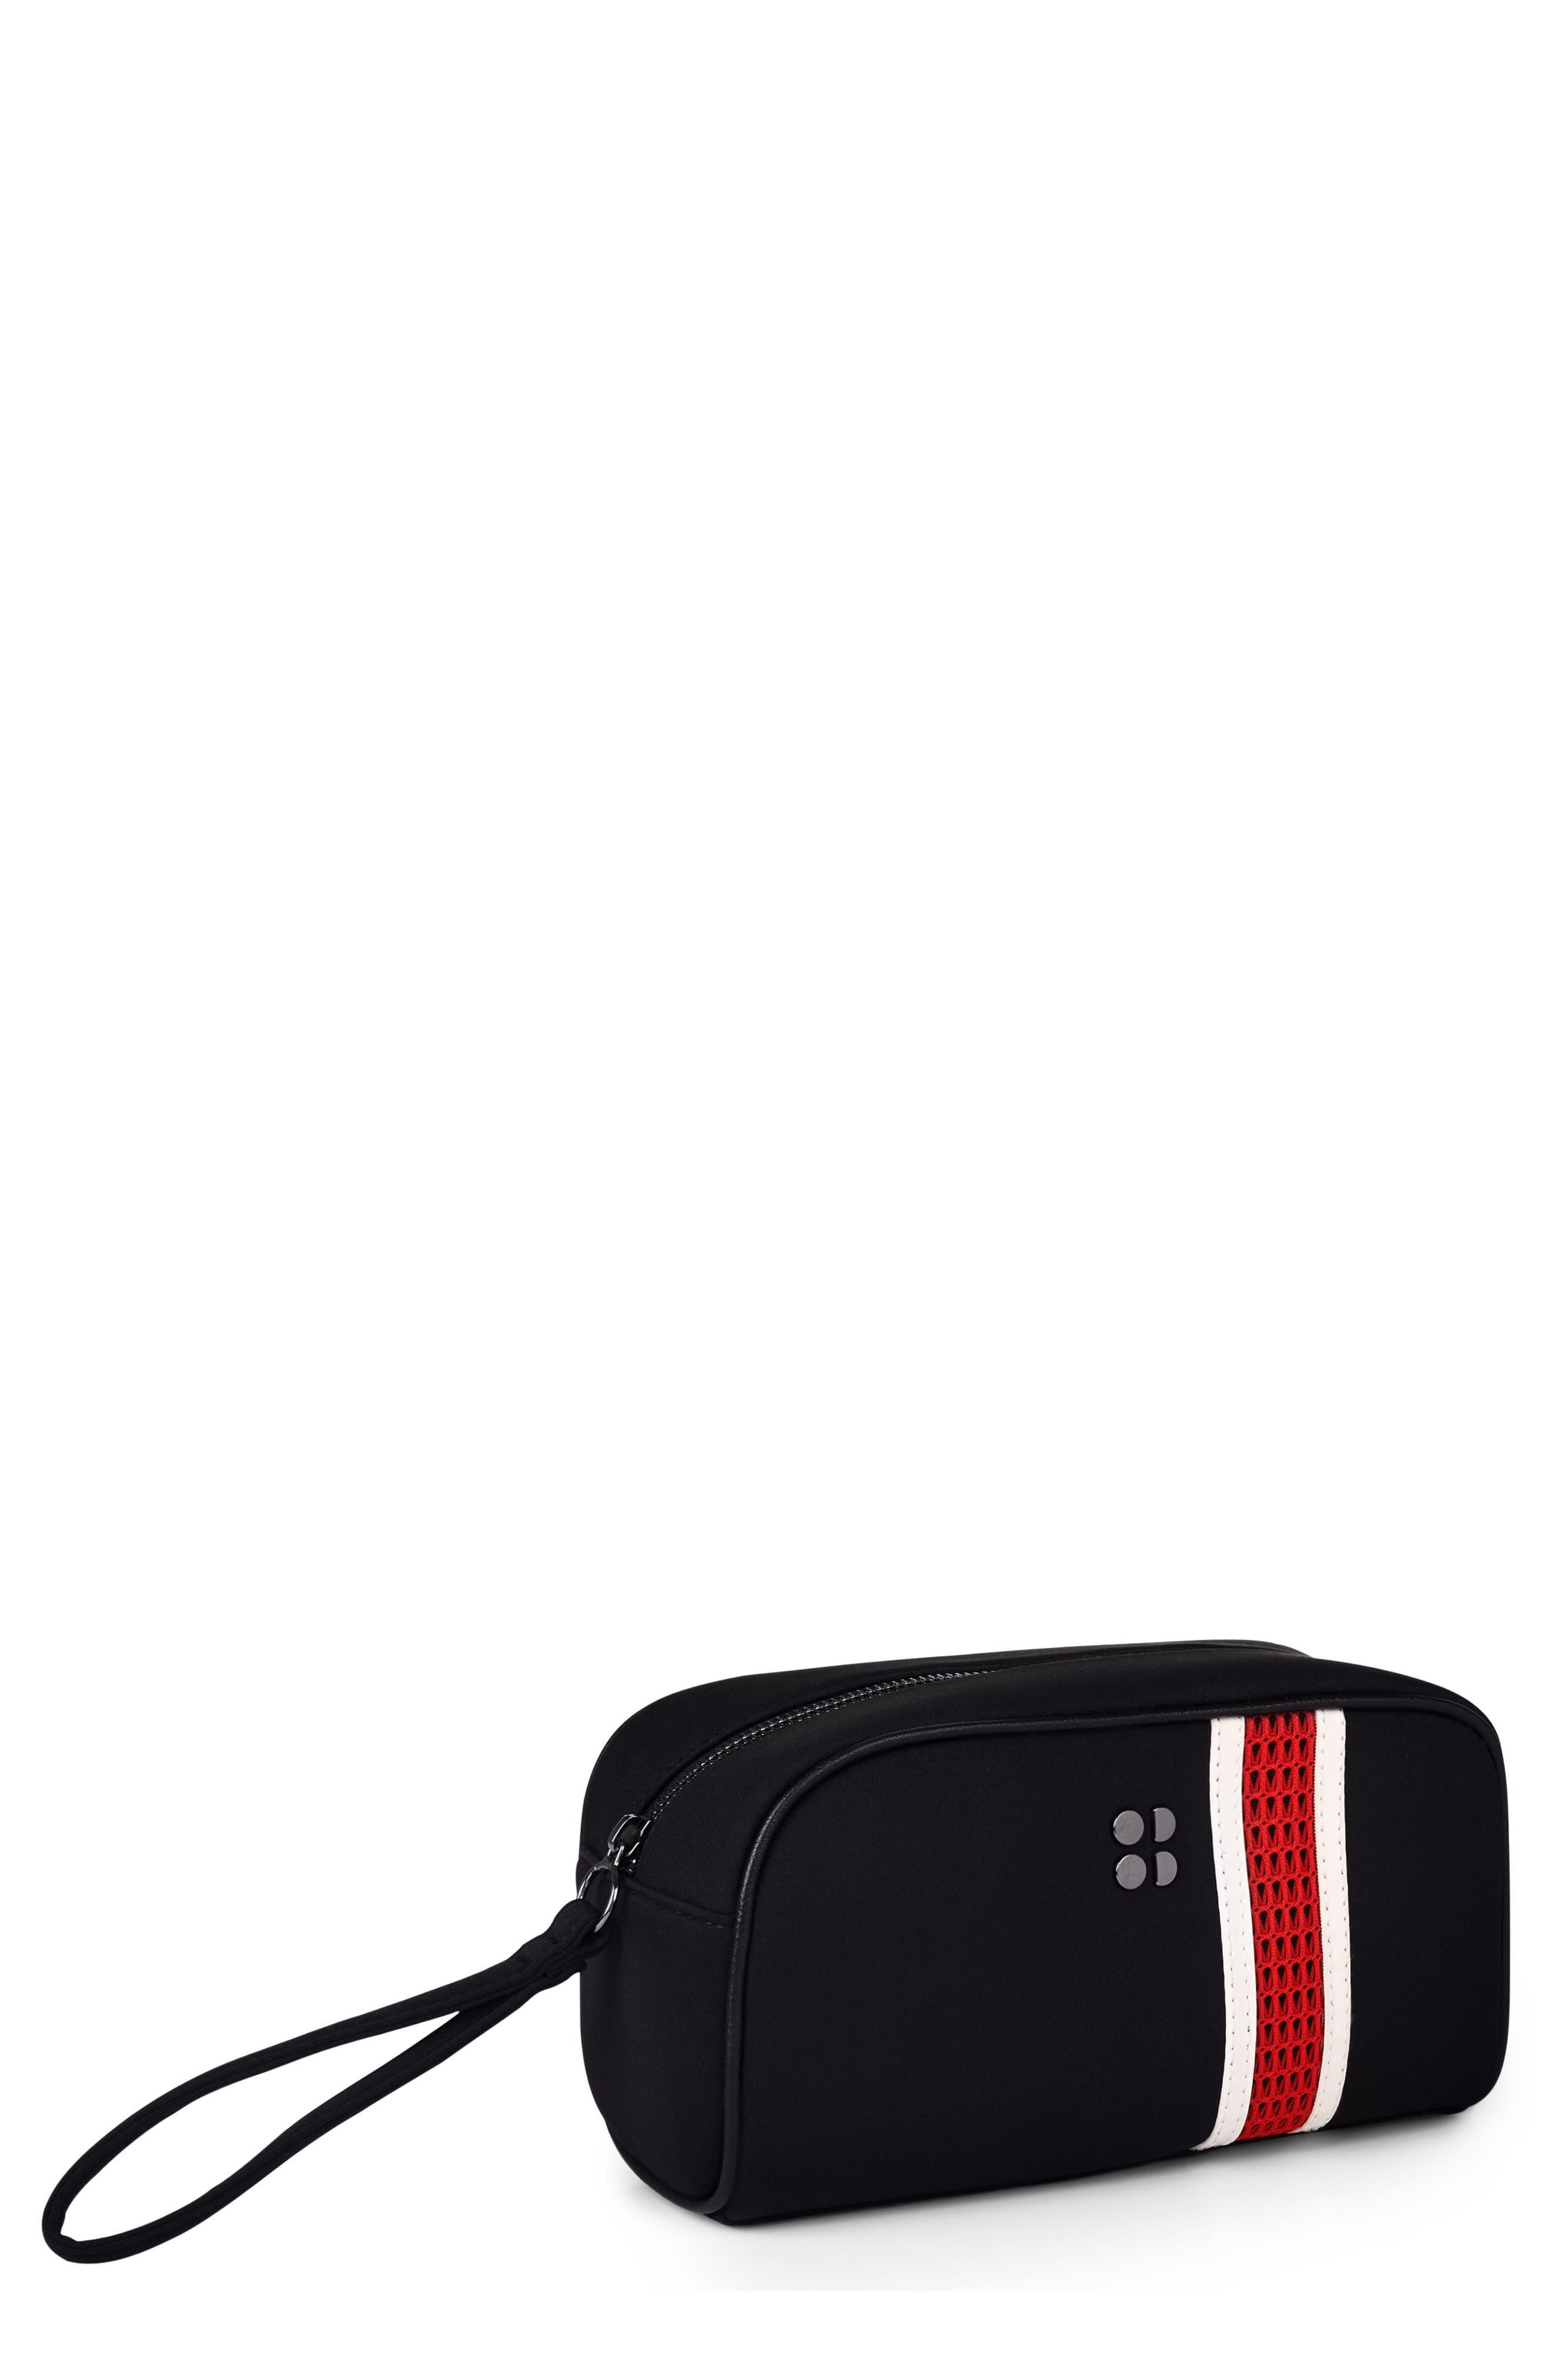 Gym Clutch,                         Main,                         color, Black